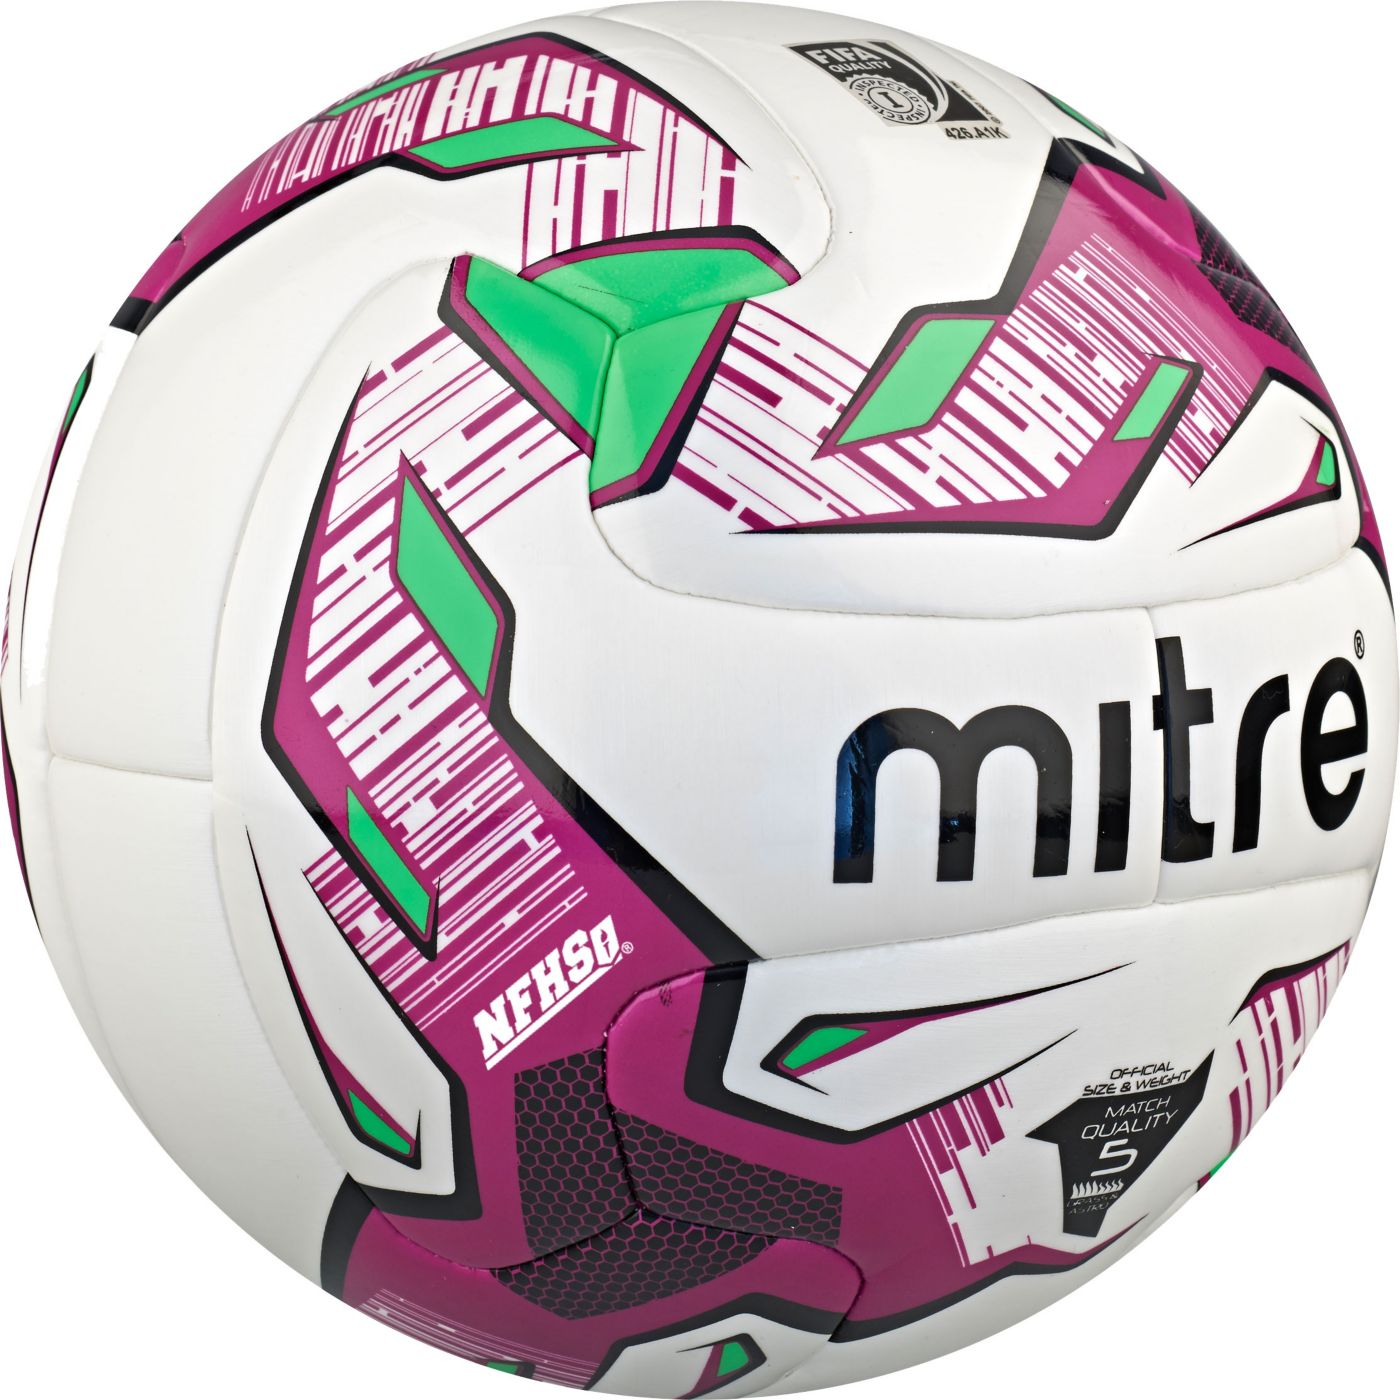 Mitre Manto V12S Hyperseam Soccer Ball